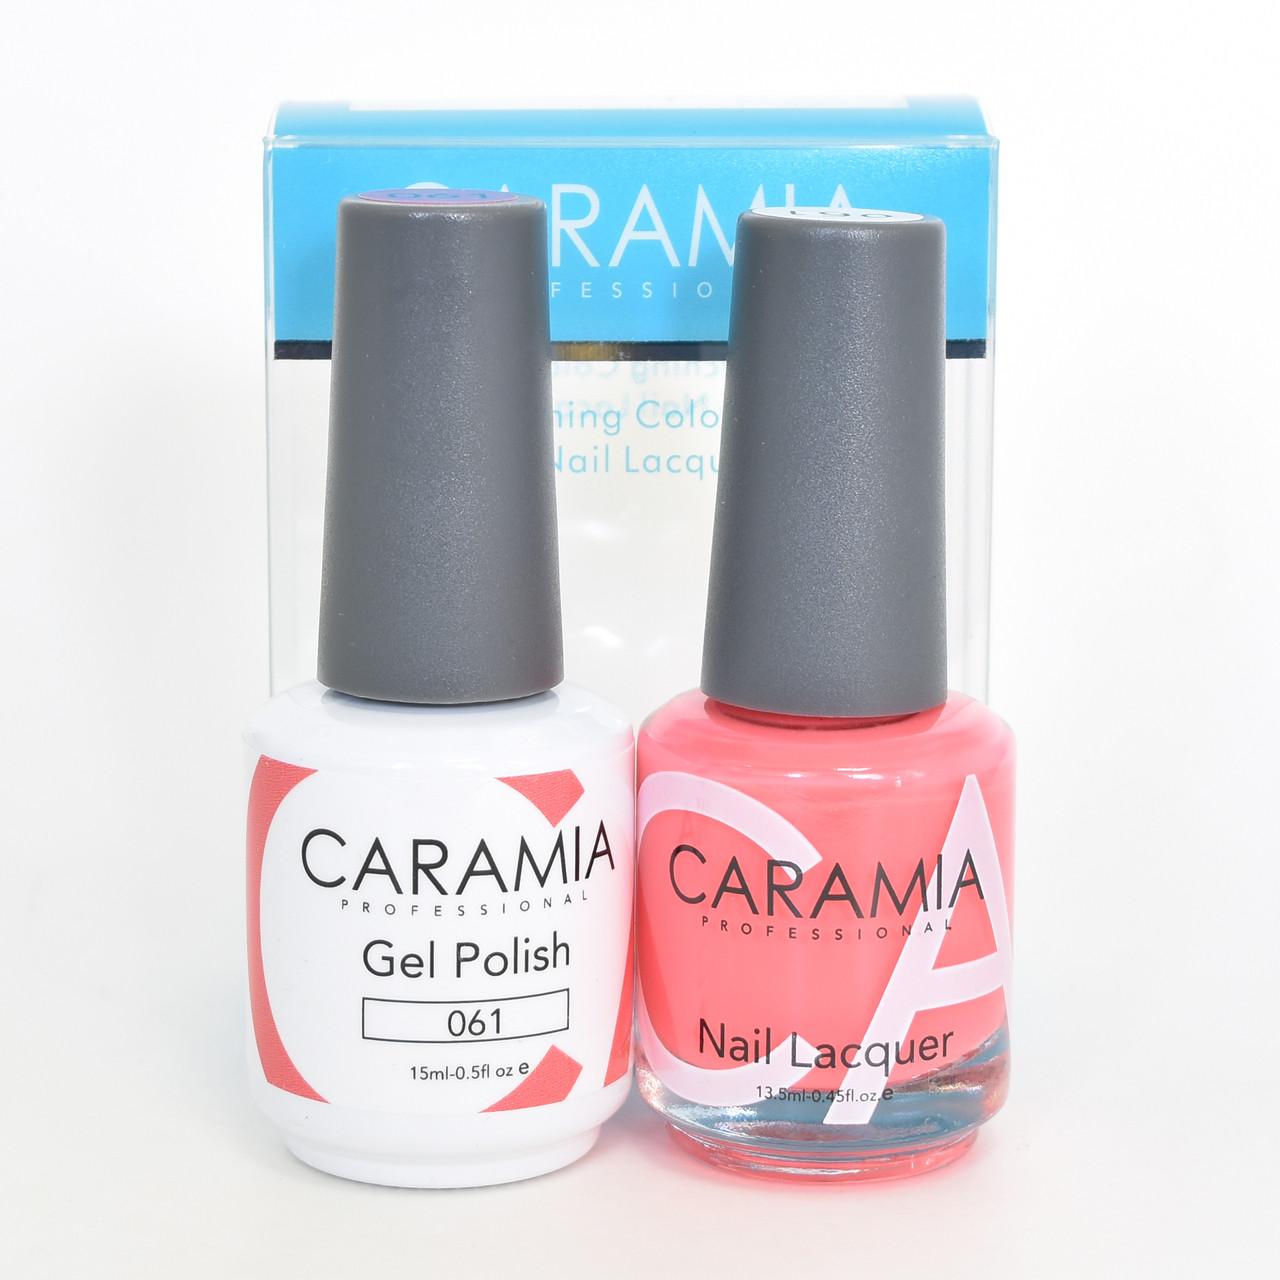 Caramia Gel Polish 15 mL & Nail Lacquer 13.5 mL Color 061 - Home ...